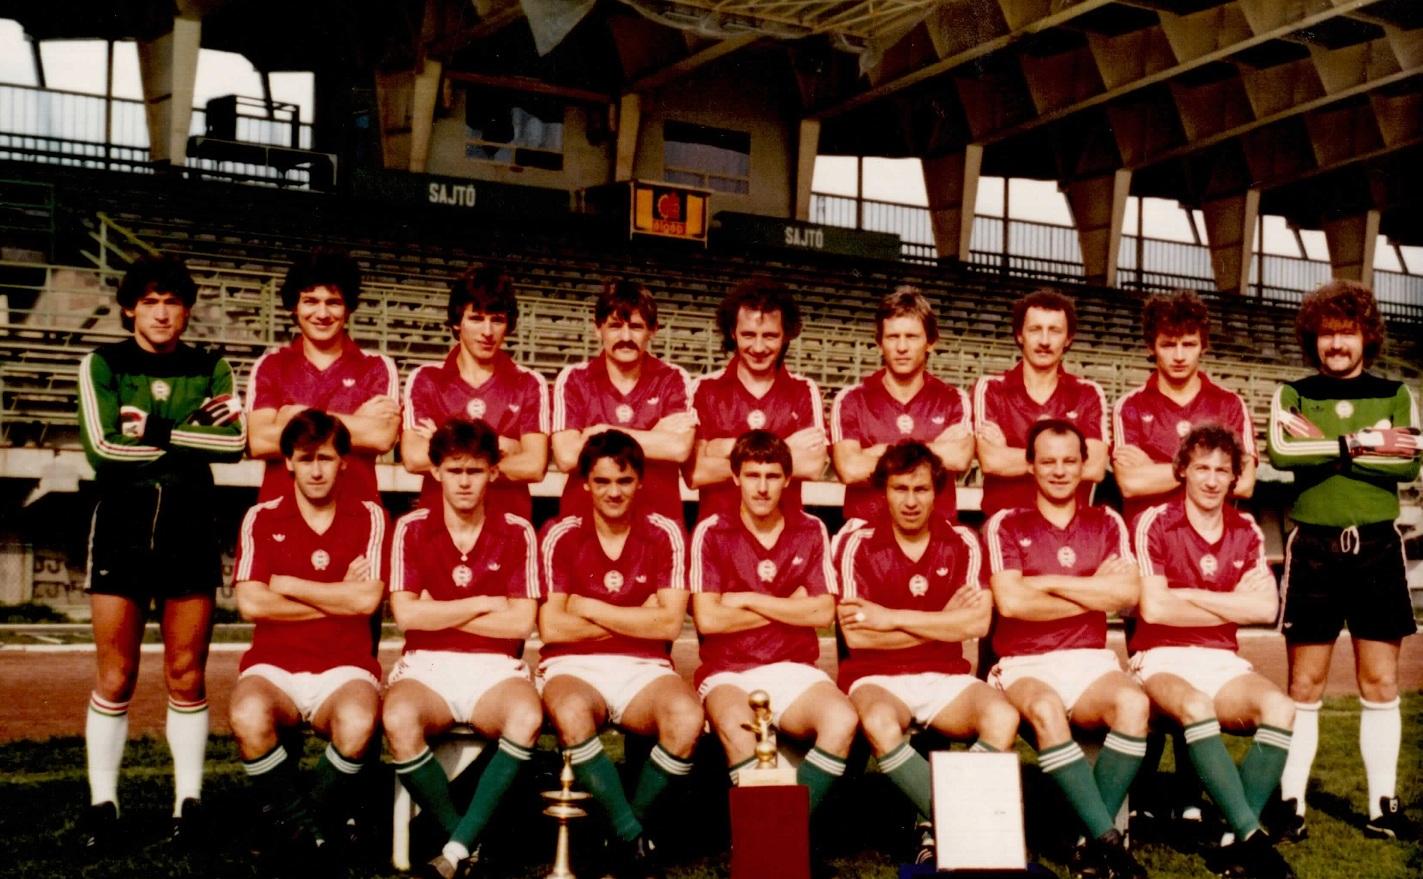 idokapszula_nb_i_1982_83_luxemburg_magyarorszag_eb-selejtezo_nehru_kupa_kupagyoztes_haladas.jpg